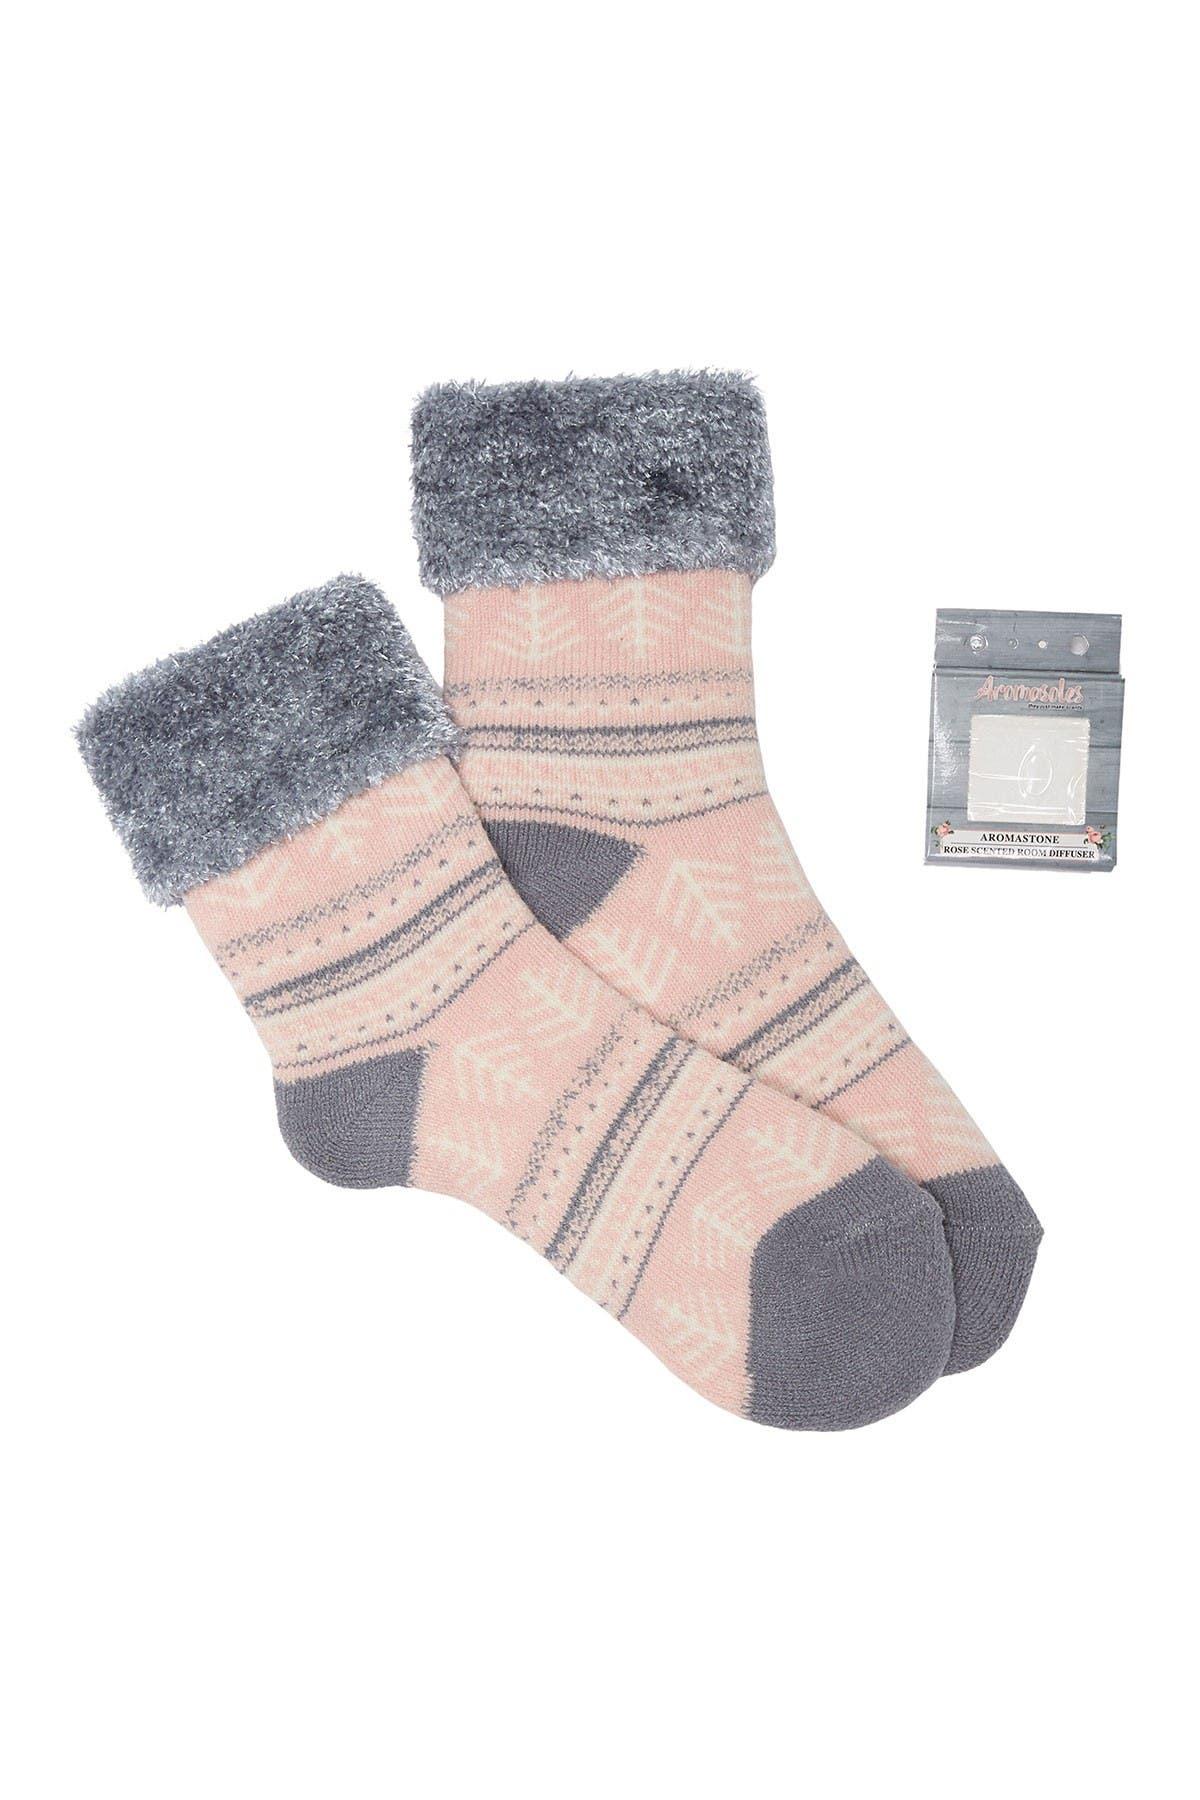 Image of Minx NY Chalet Lounge Rose Infused Socks